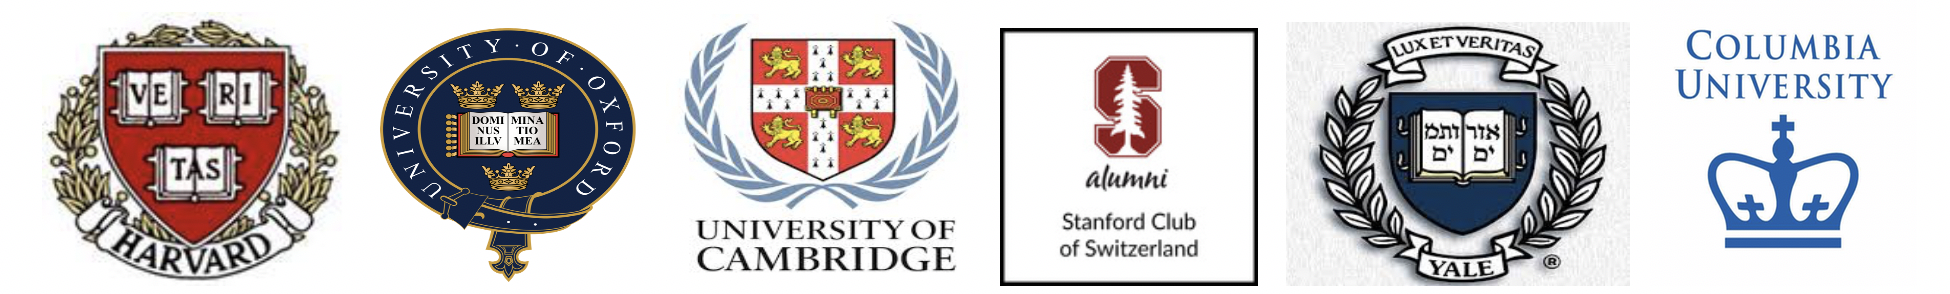 joint_alumni_logos-6